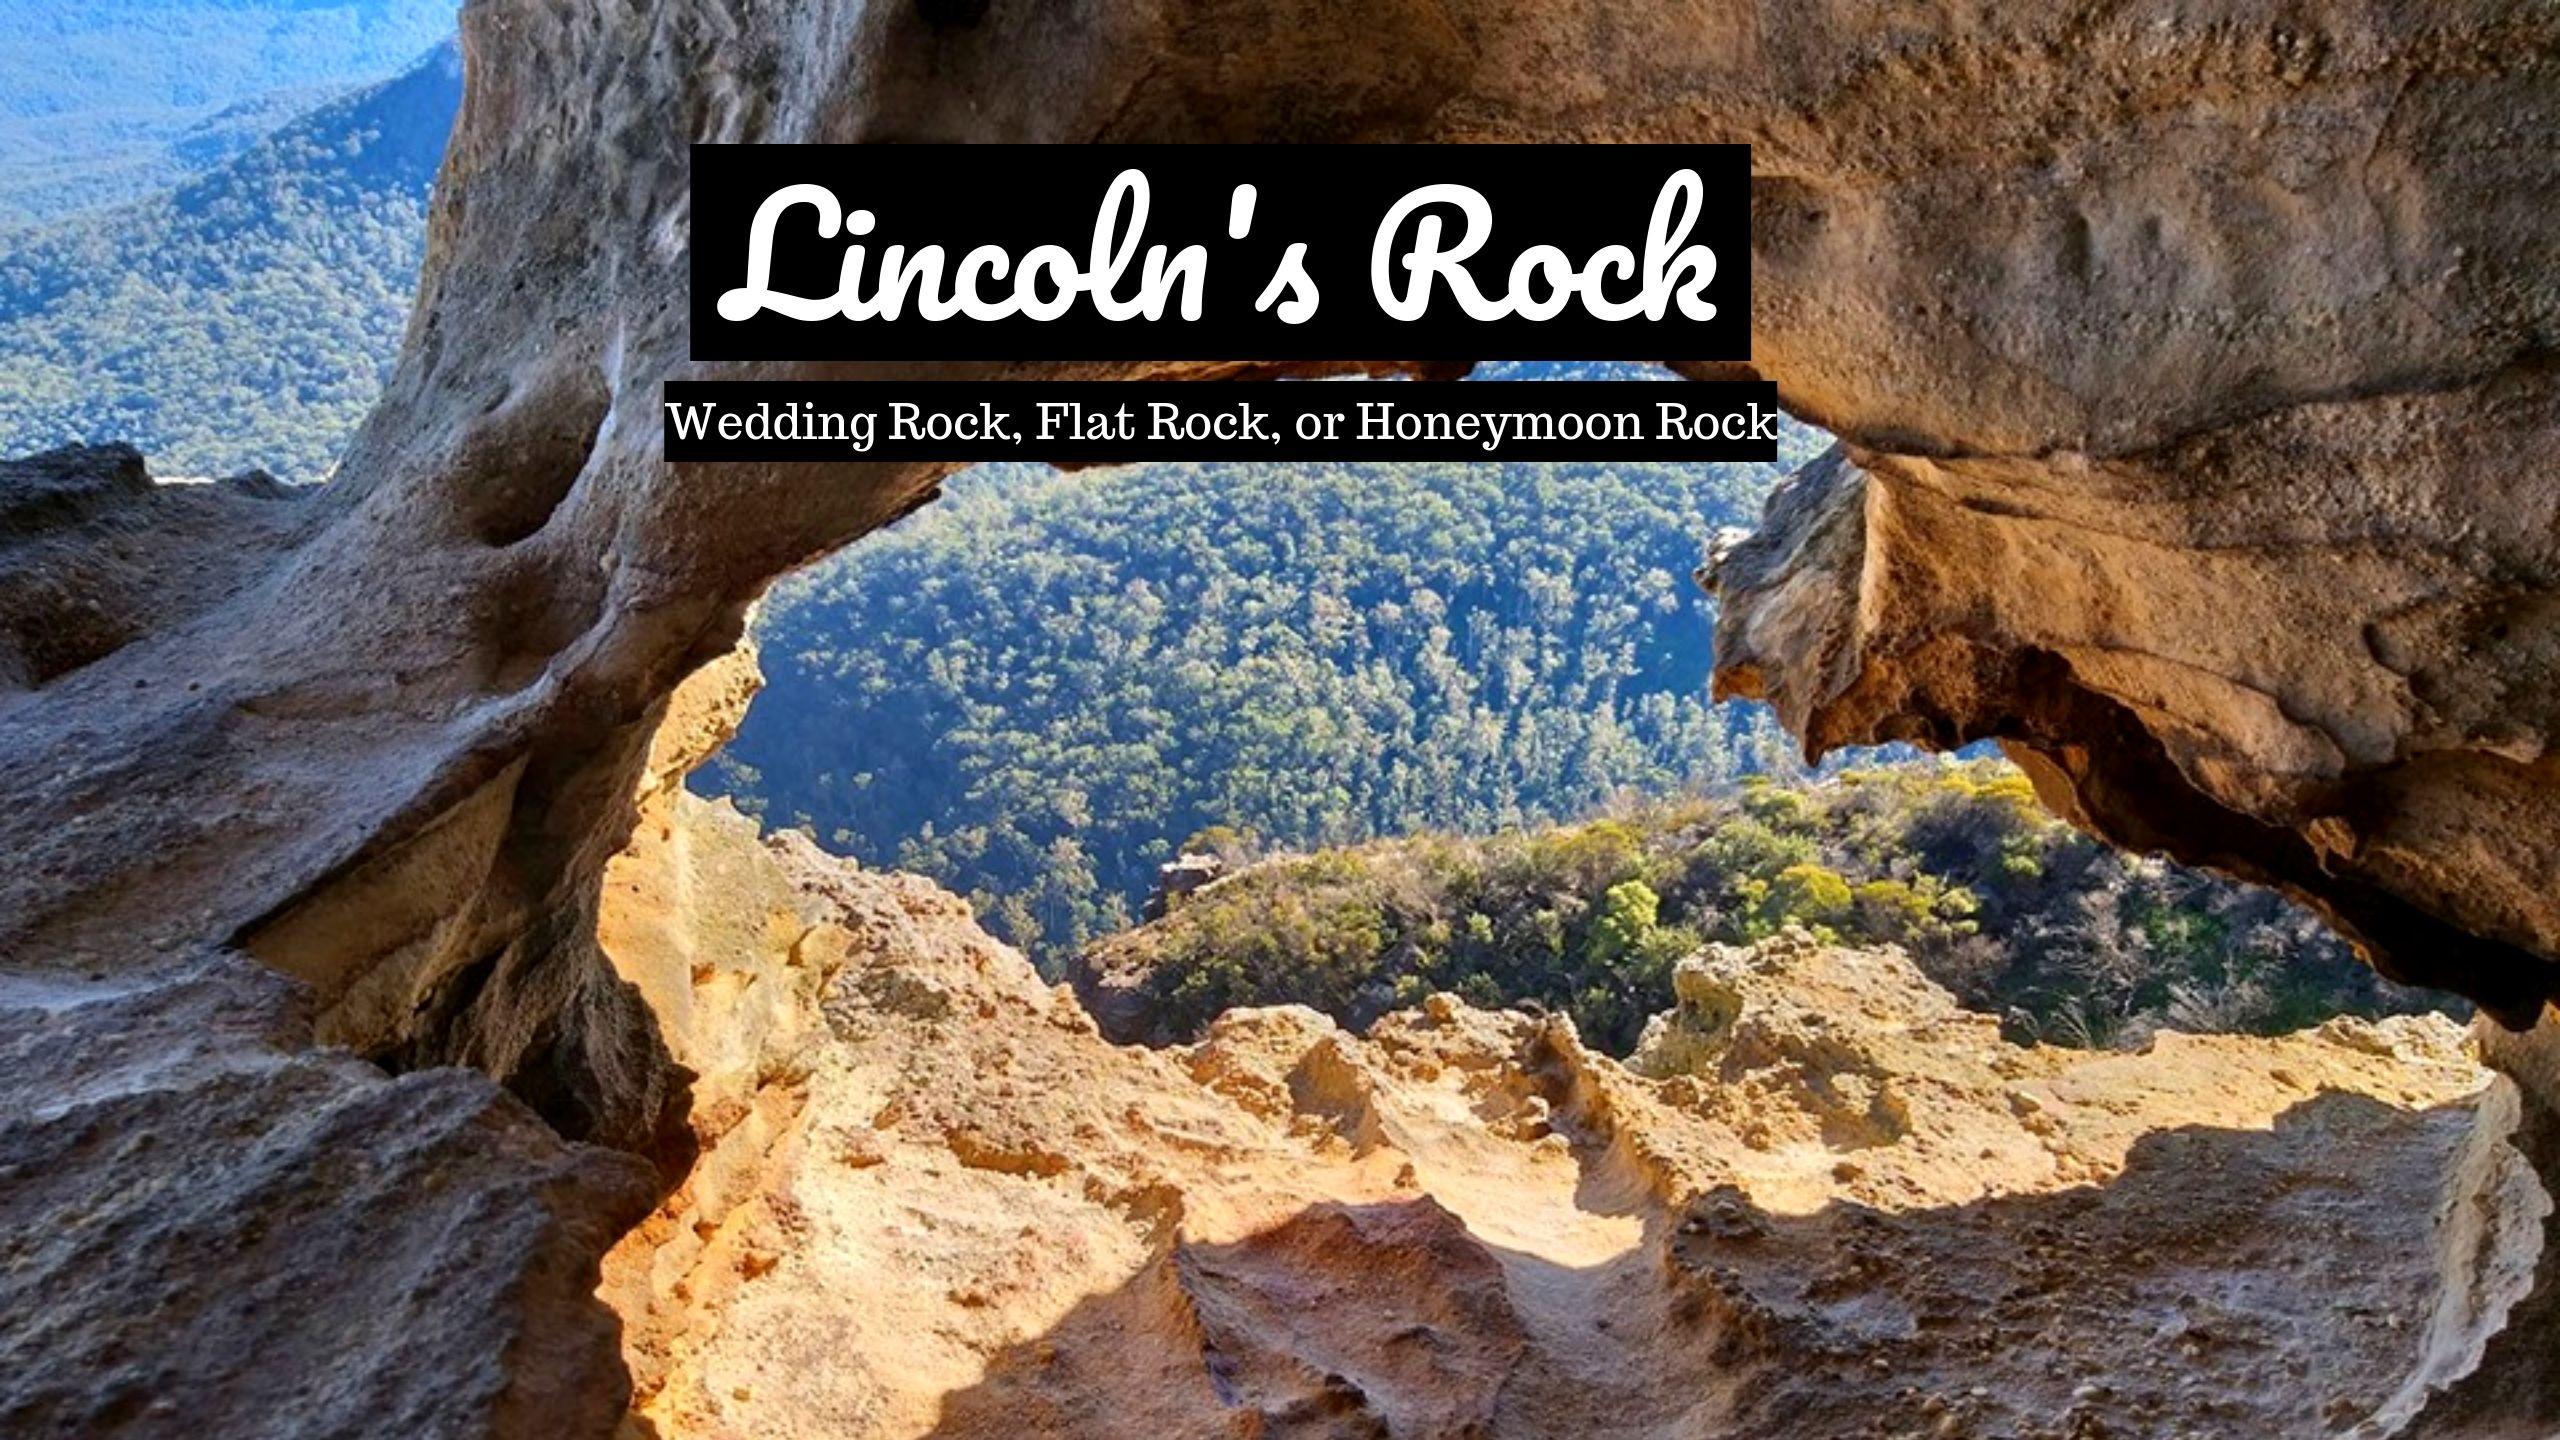 Lincoln's Rock, Lincoln's Rock